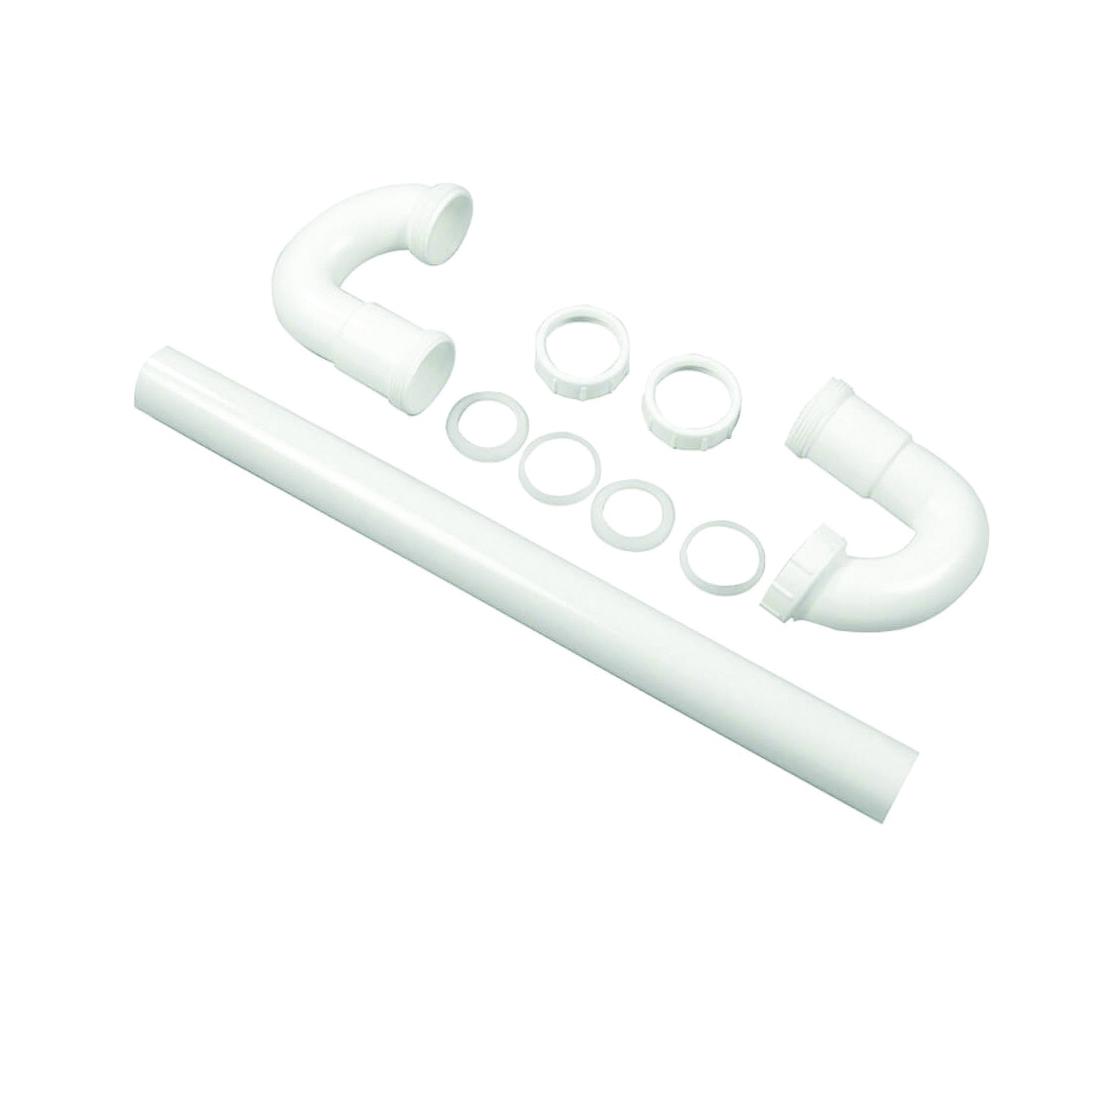 Picture of Danco 94007 S-Trap, 1-1/2 in, Slip Joint, Plastic, White